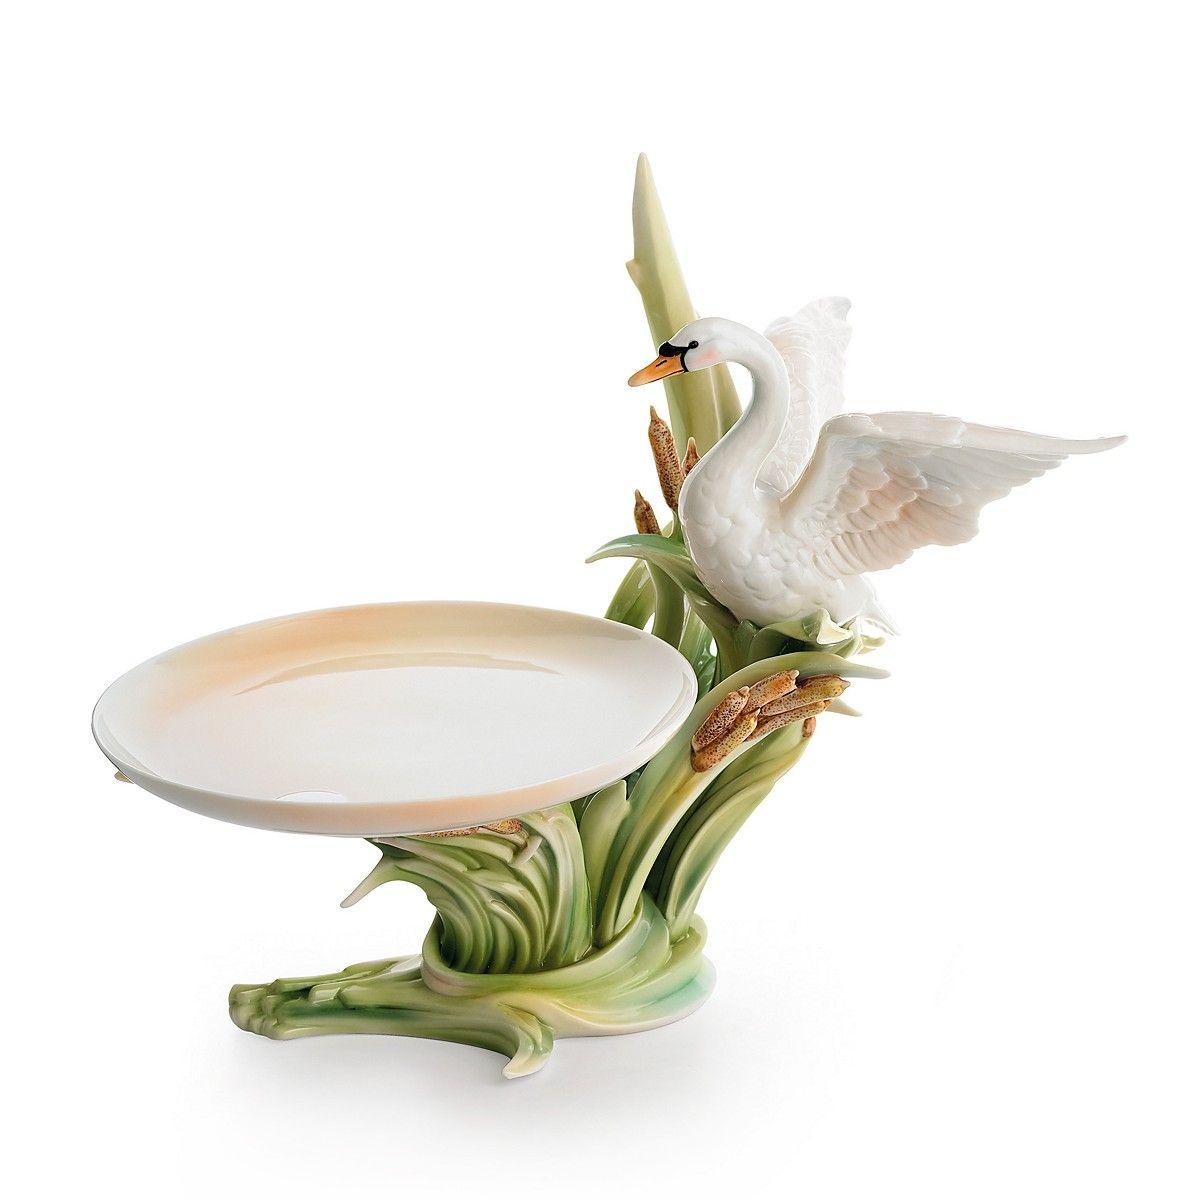 Swan Lake Candy Dish in 2020 Porcelain, Fine porcelain